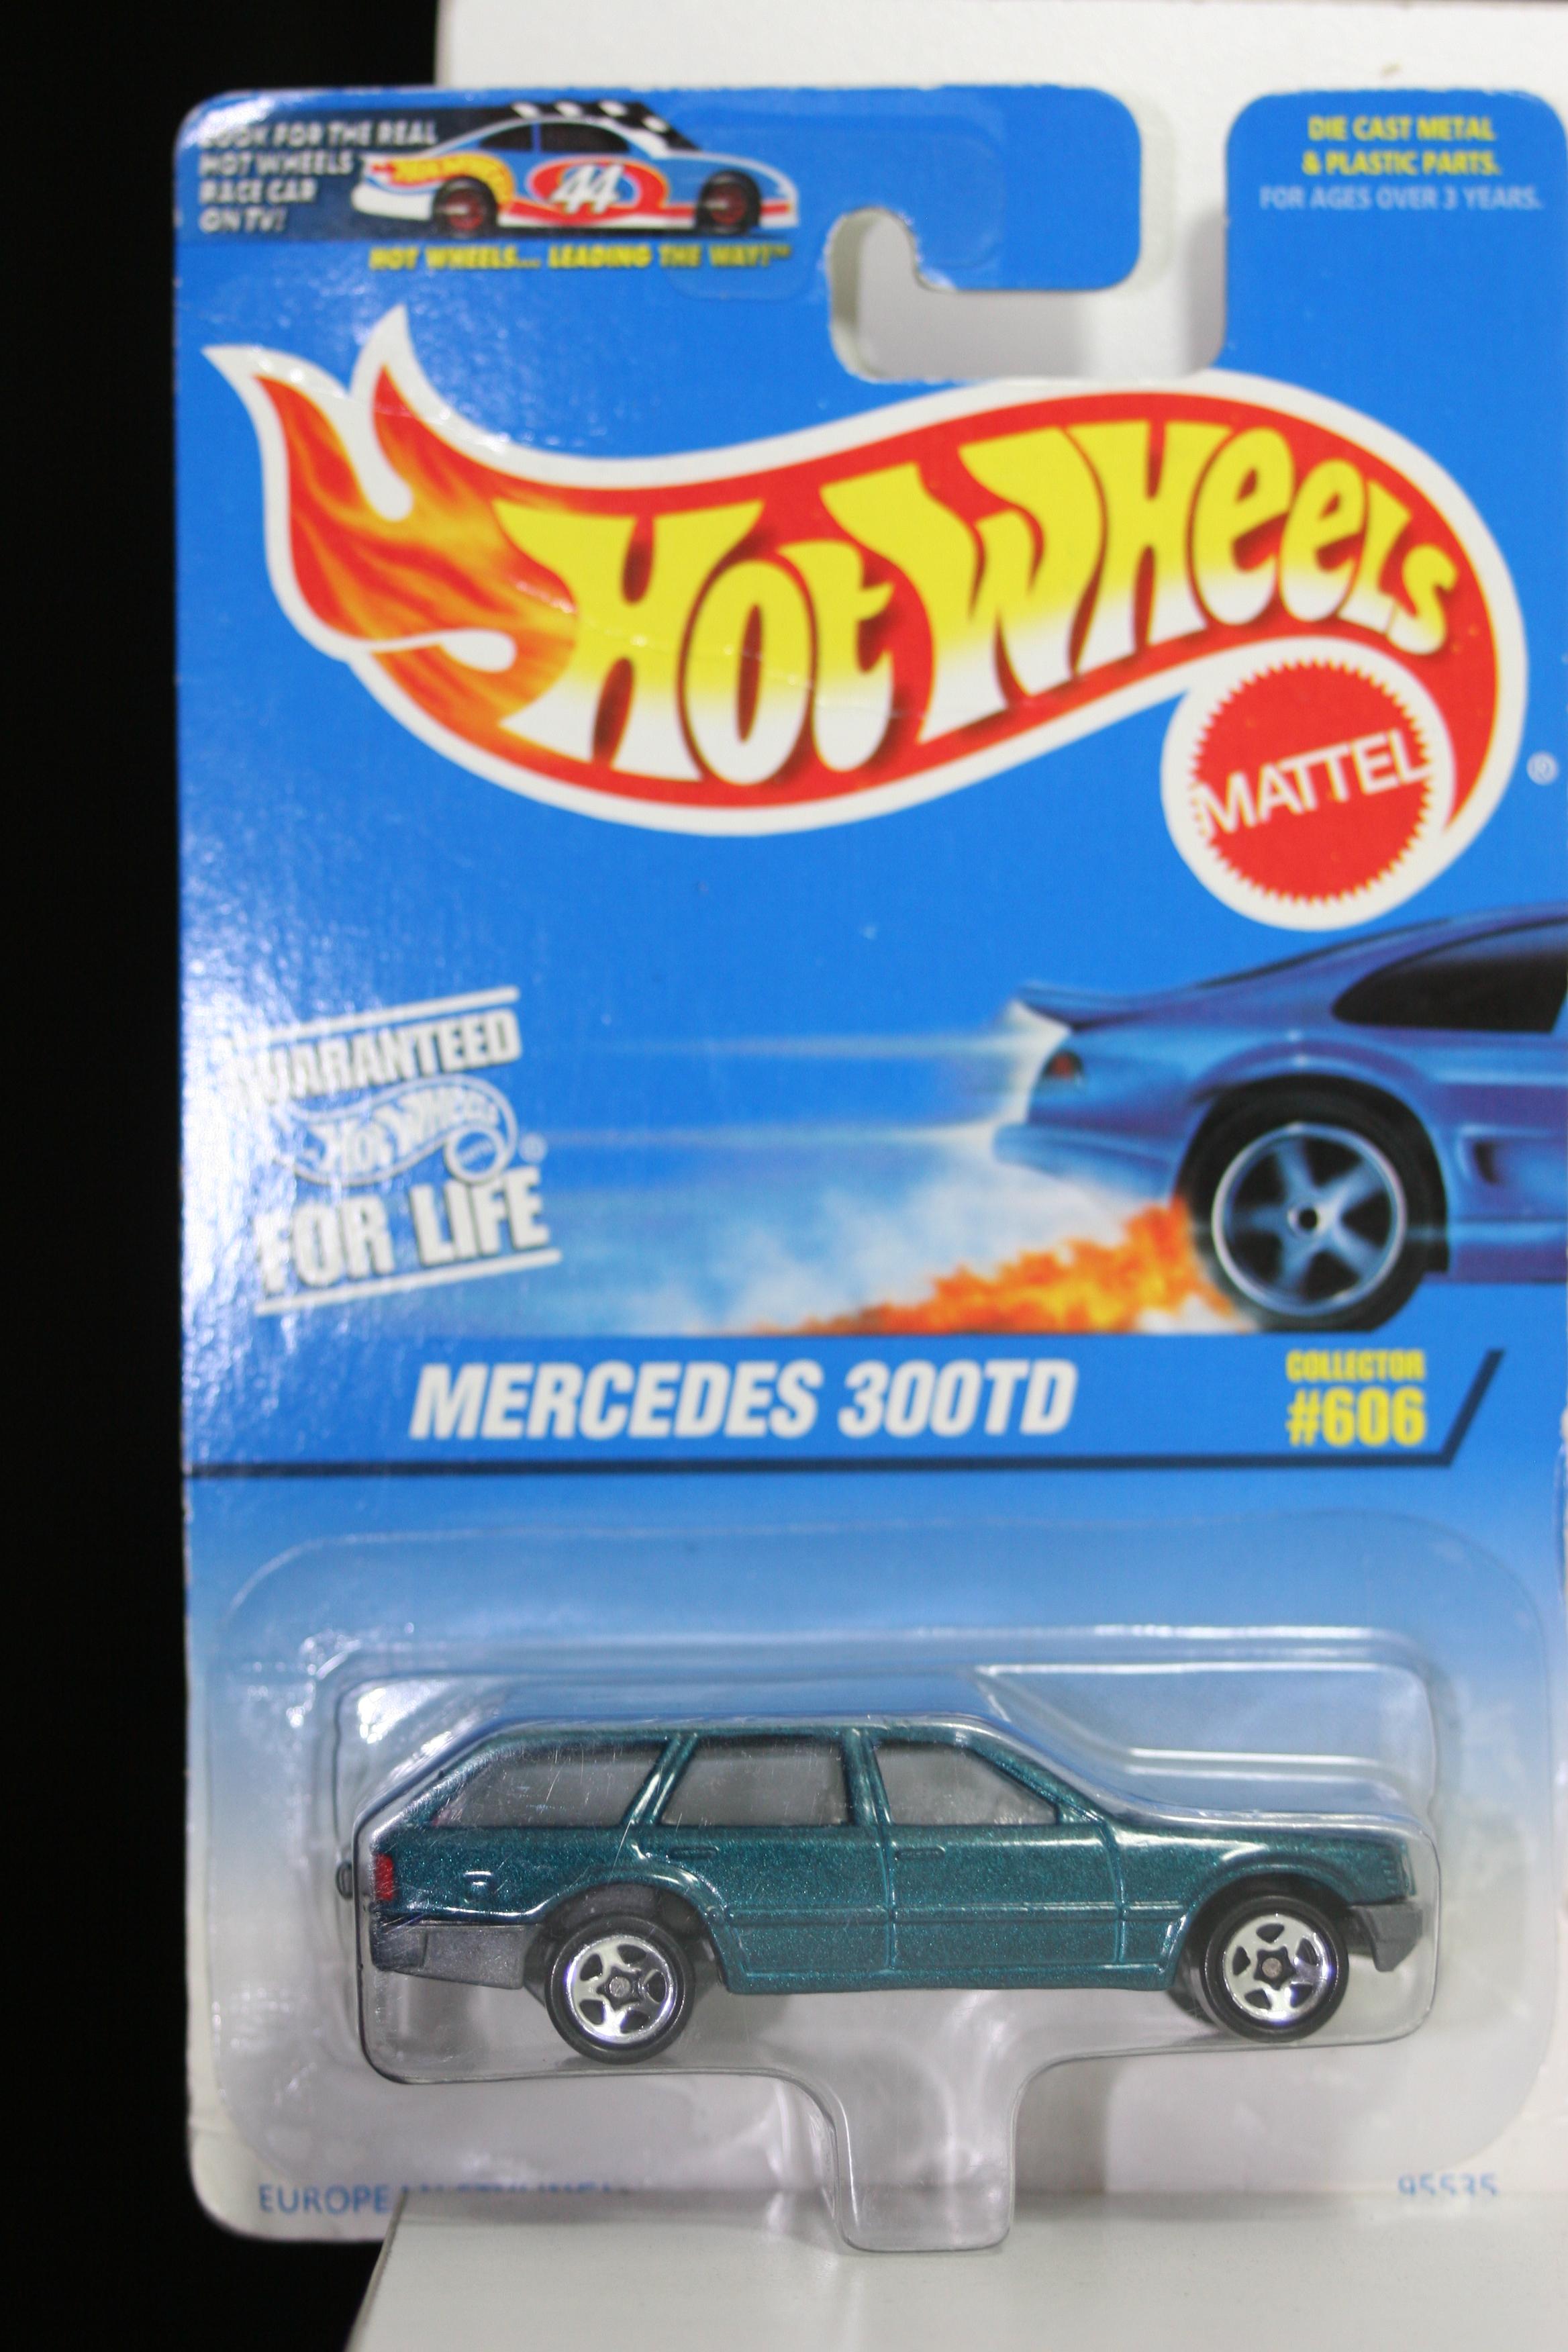 Mercedes 300TD